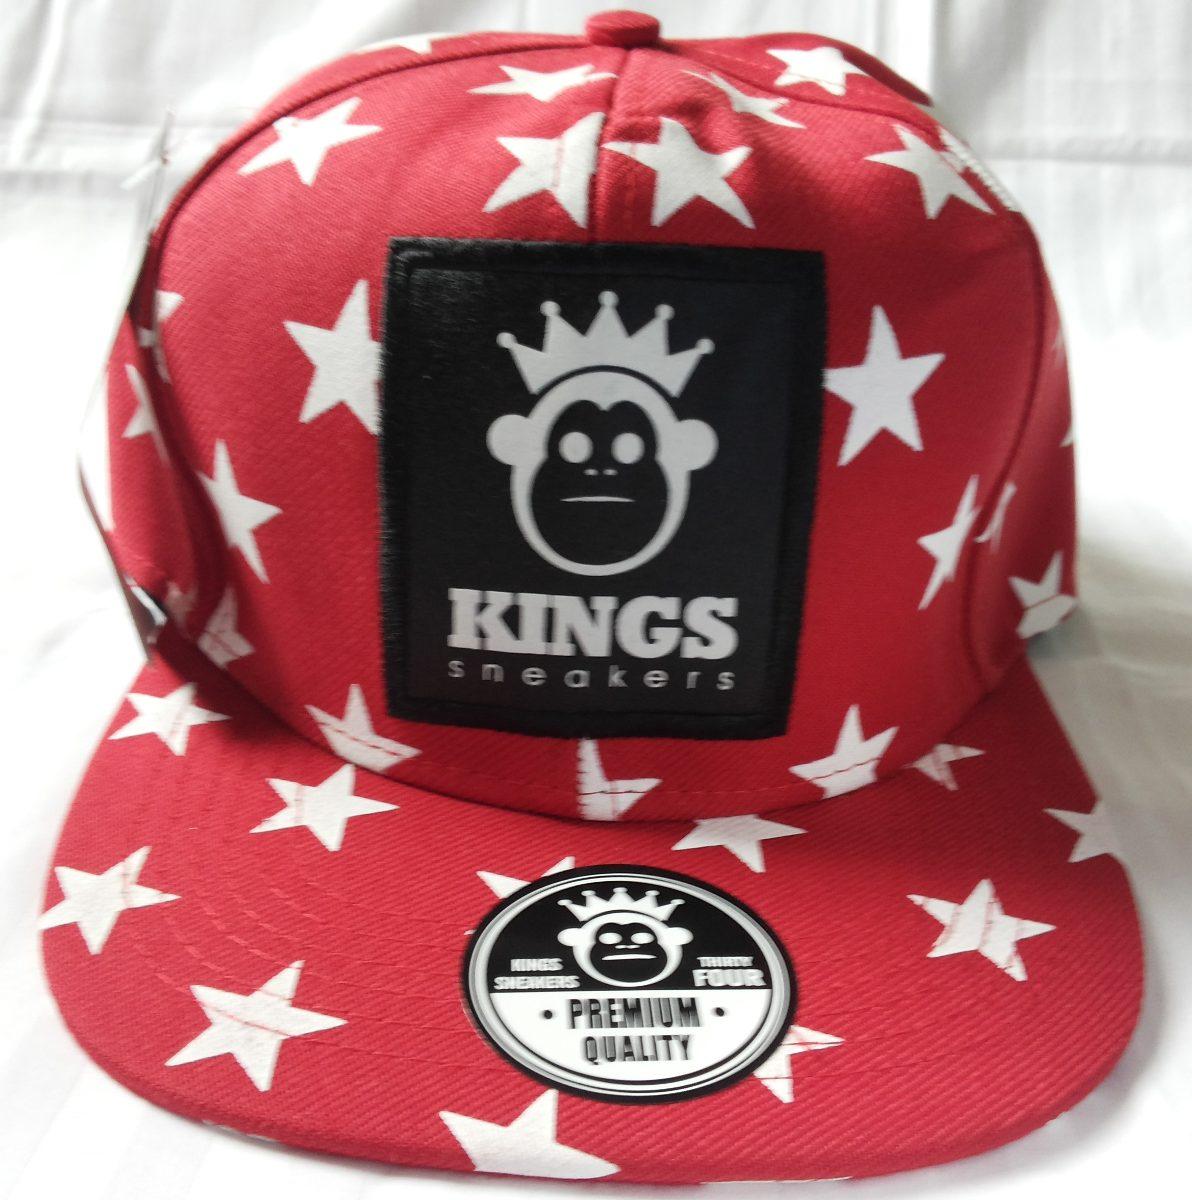 bb92c12832fa9 Boné Aba Reta Estrelado Kings Star Monkey Vermelho Branco - R  39